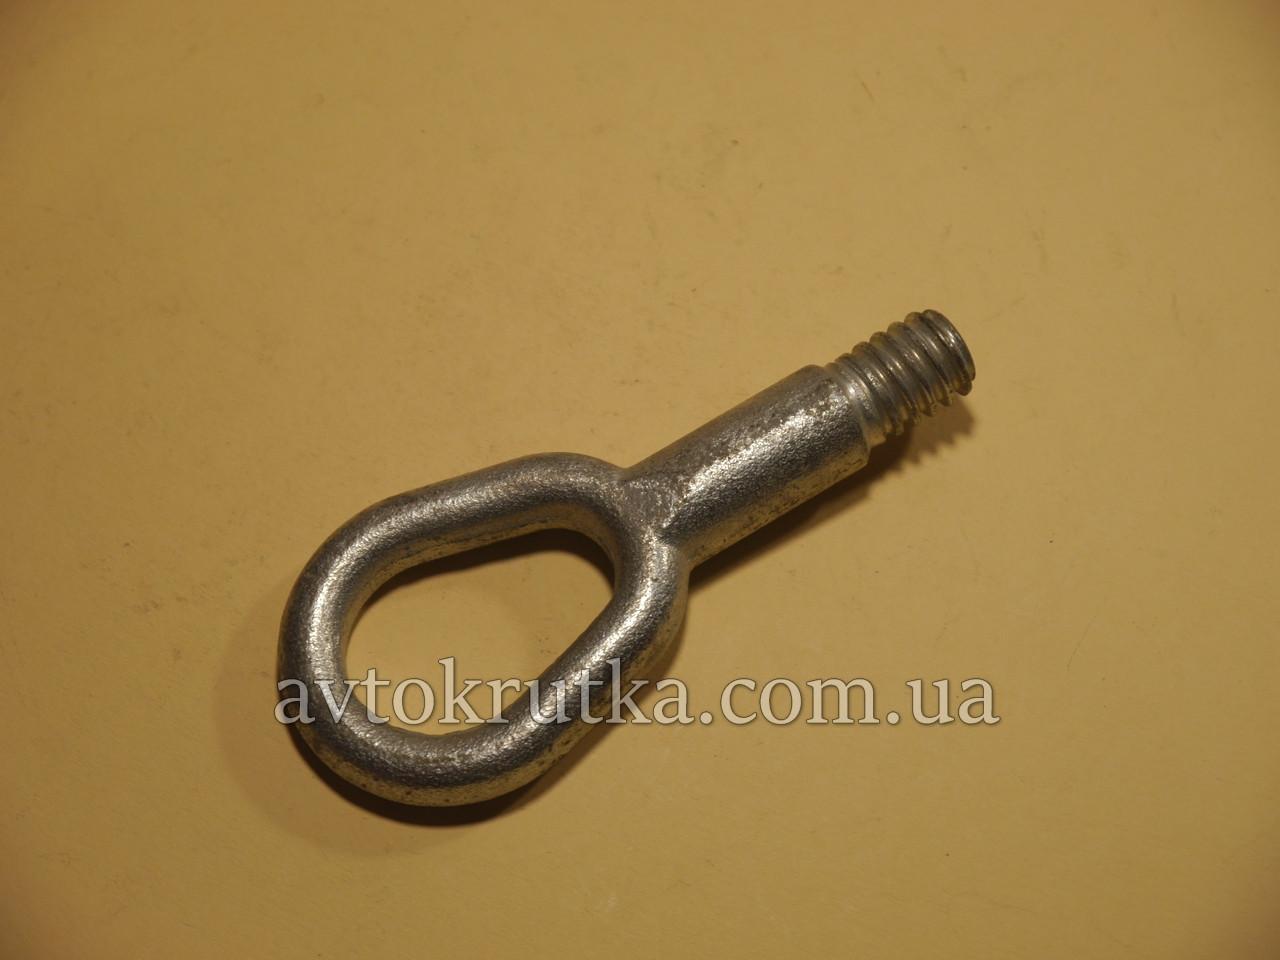 Буксировочный крюк Smart Fortwo (Смарт Форту) Q0000957V002000000